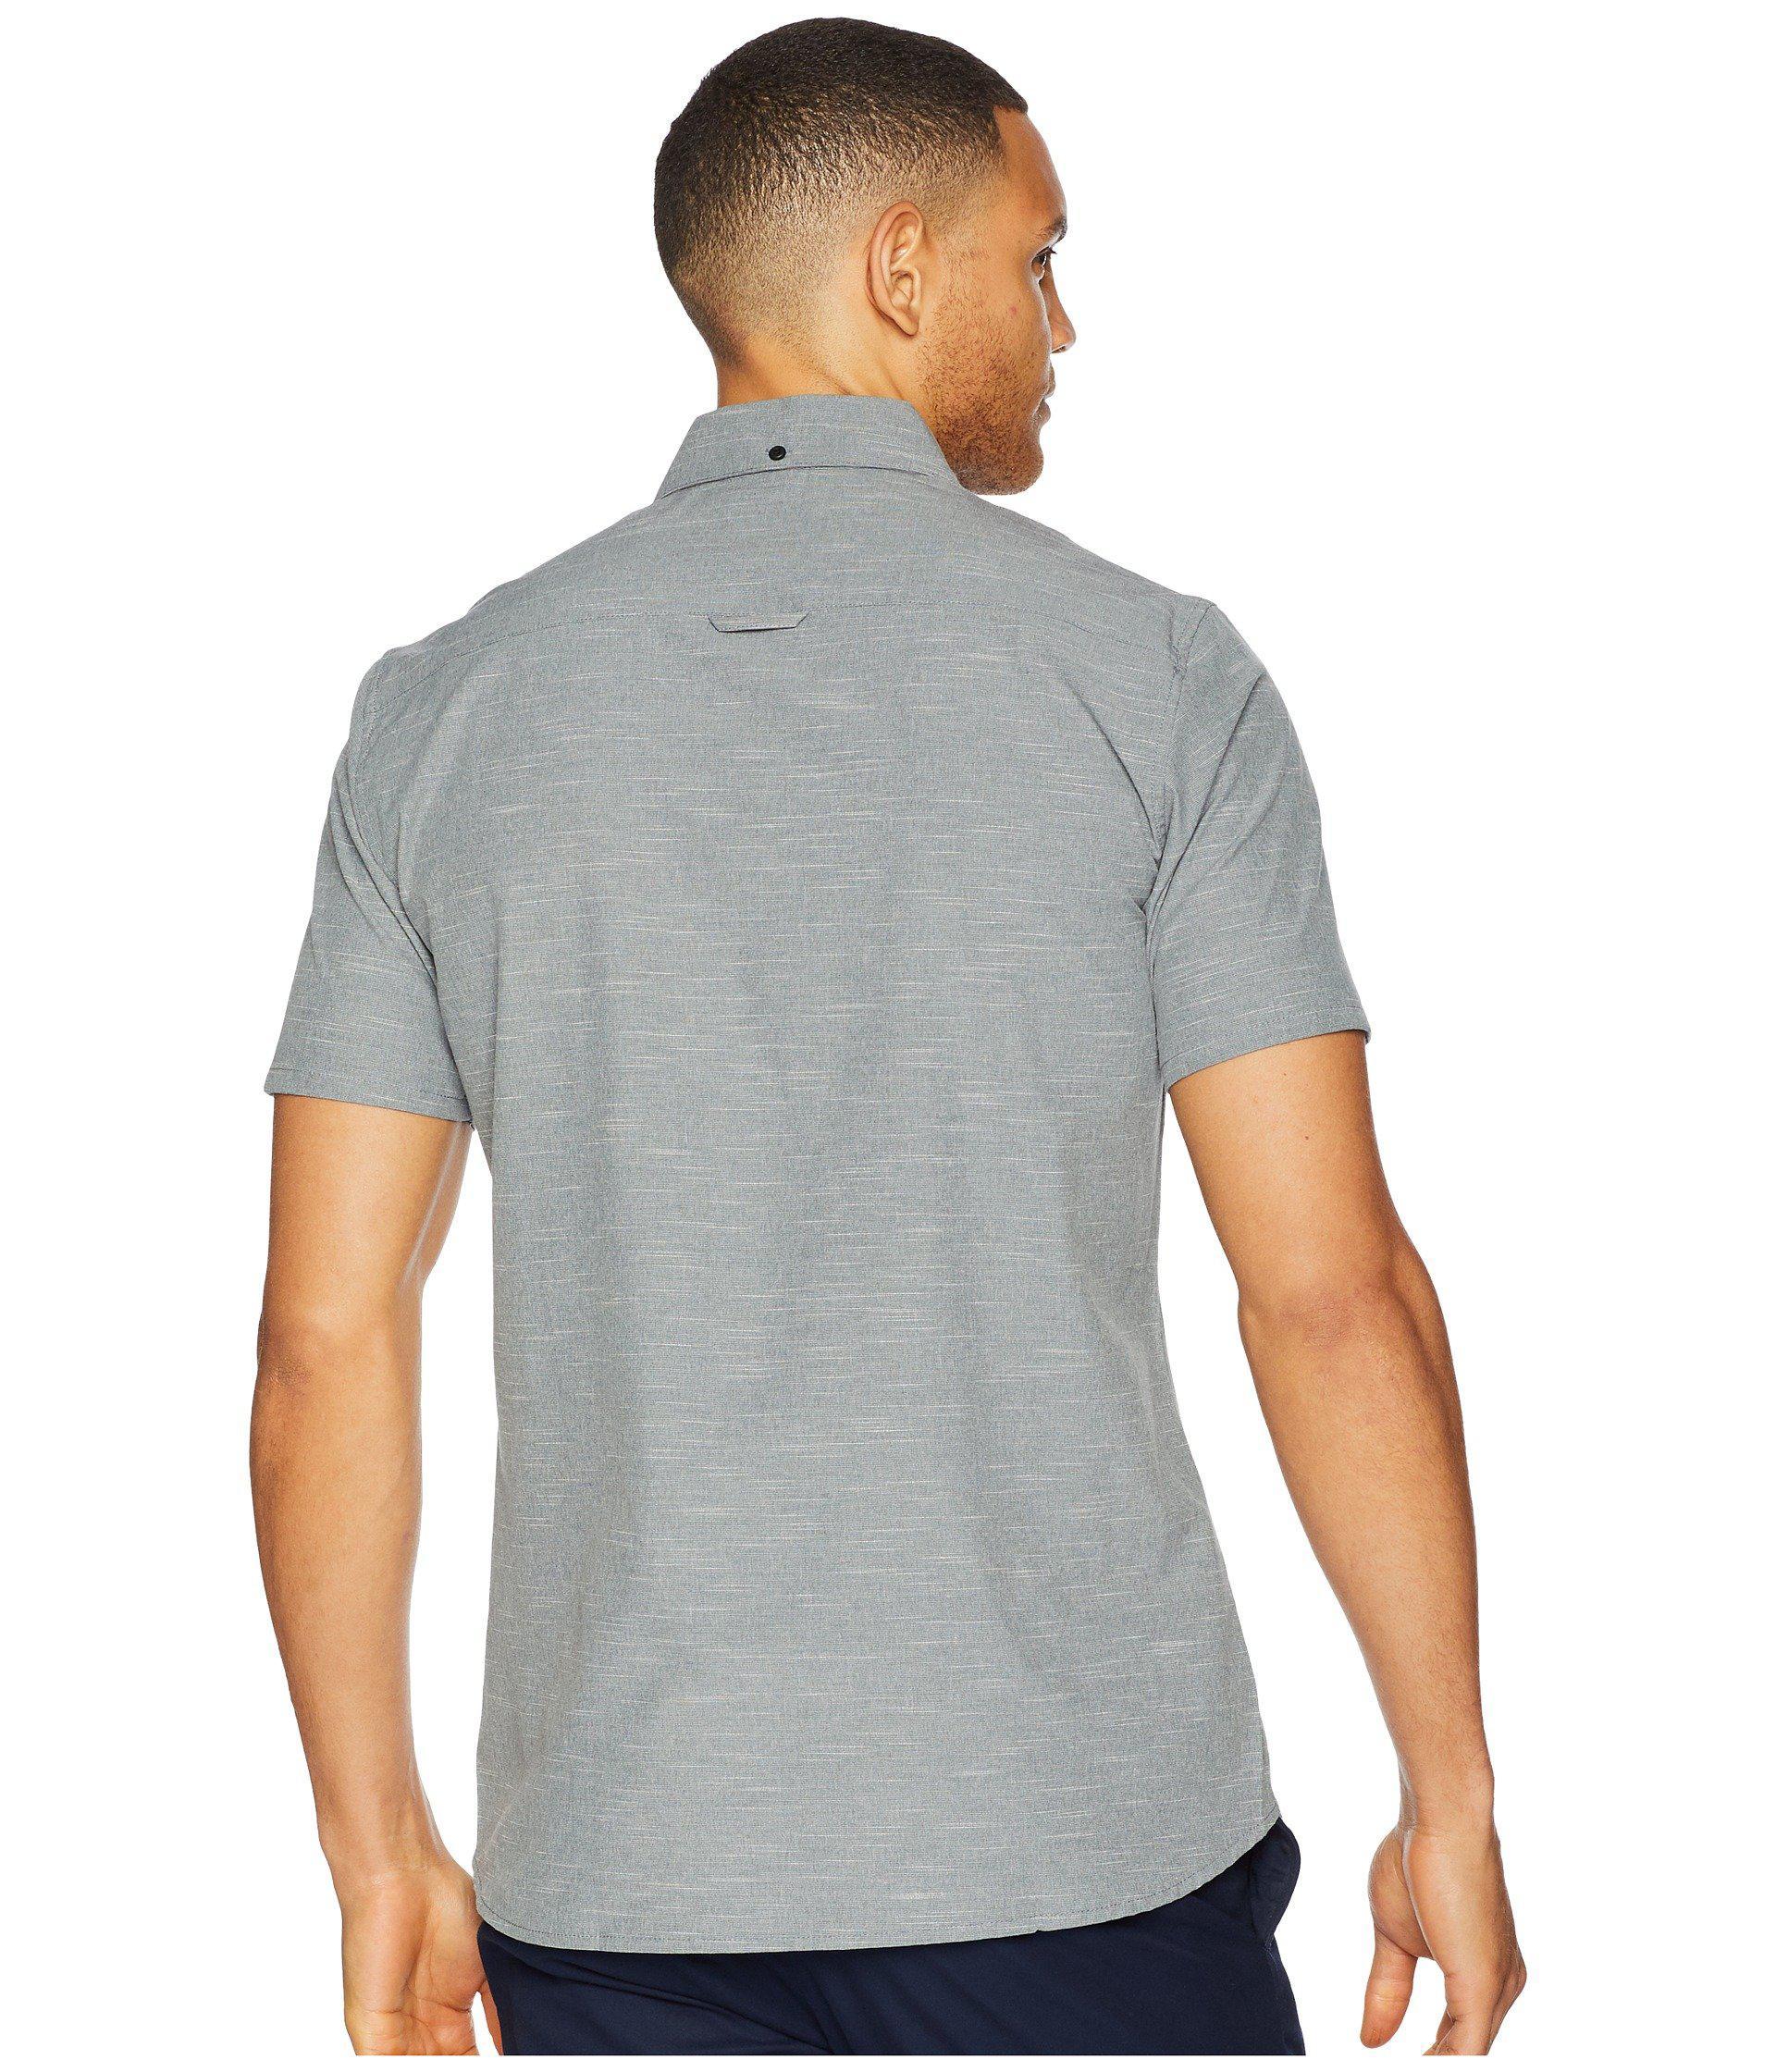 Lyst Hurley Alchemy Short Sleeve Woven In Black For Men Shirt Navy View Fullscreen